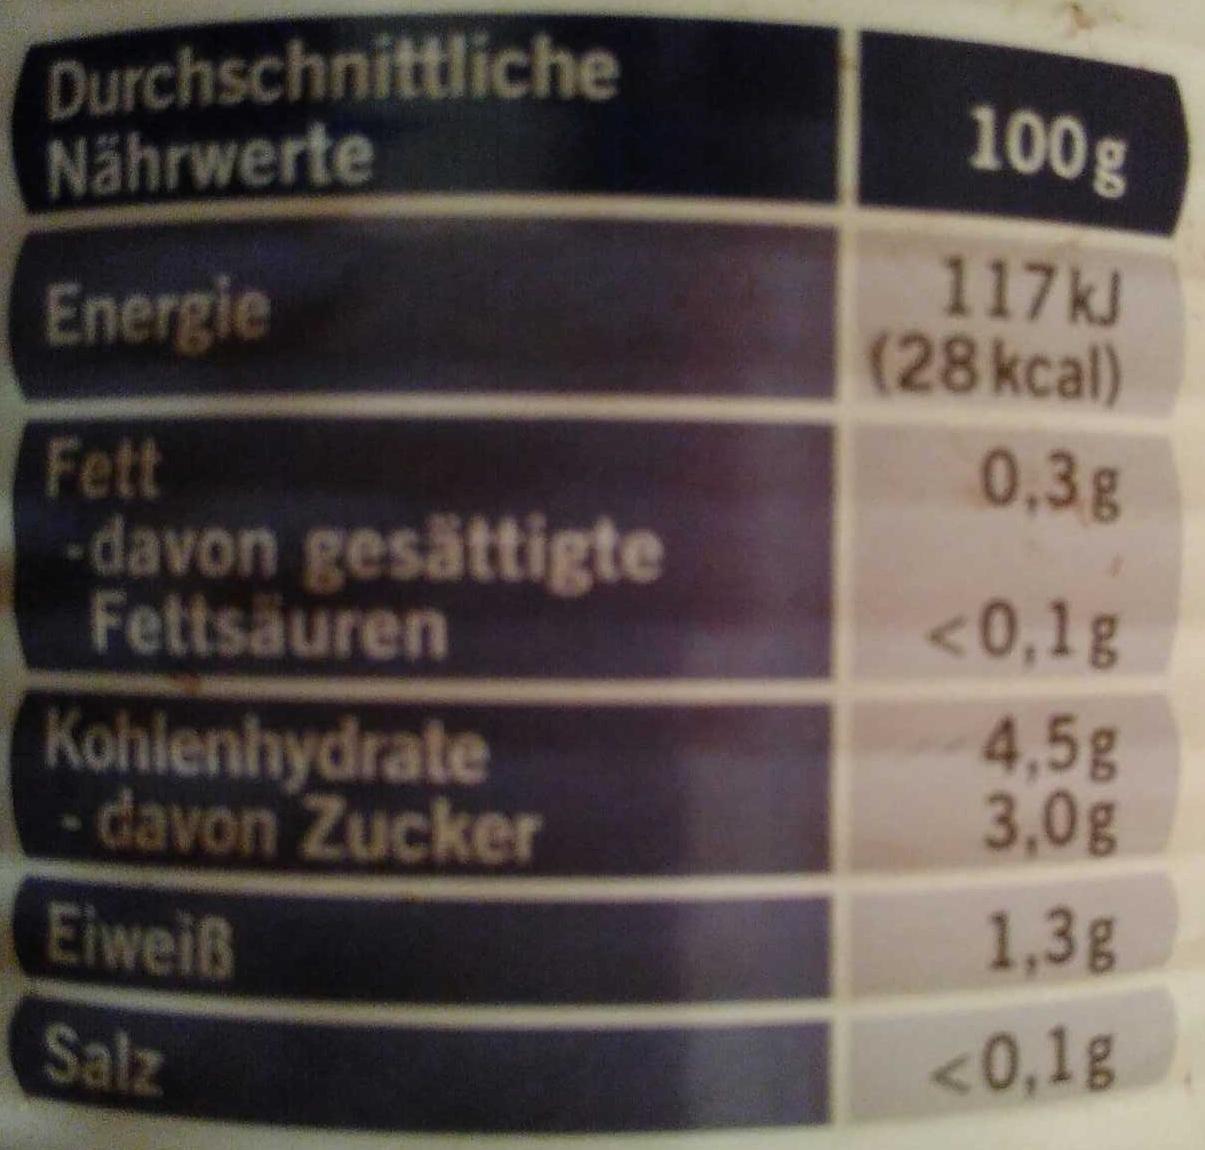 Tomaten Stückchen Cubetti - Informations nutritionnelles